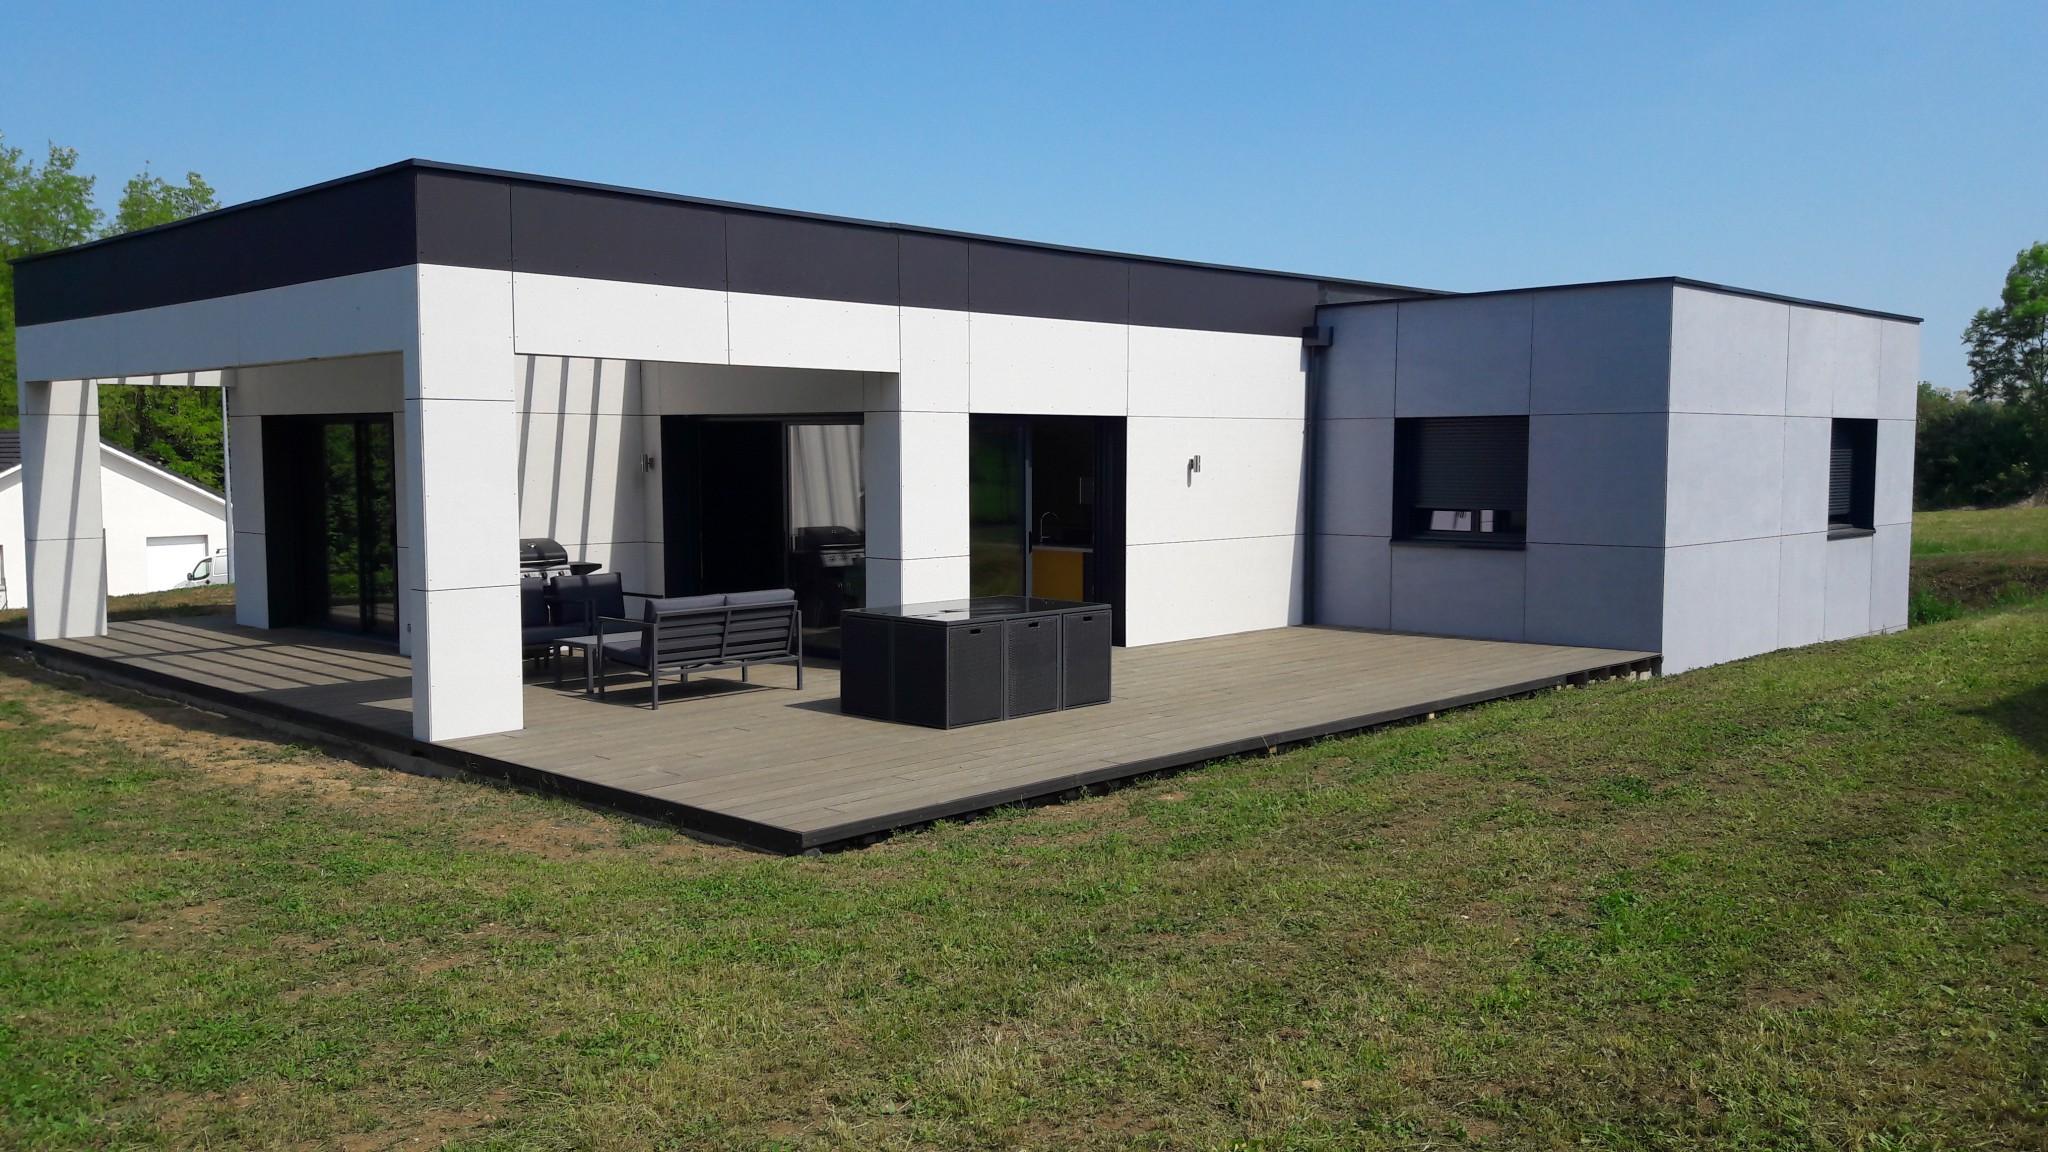 maison 160 m en bourgogne franche comt popup house. Black Bedroom Furniture Sets. Home Design Ideas